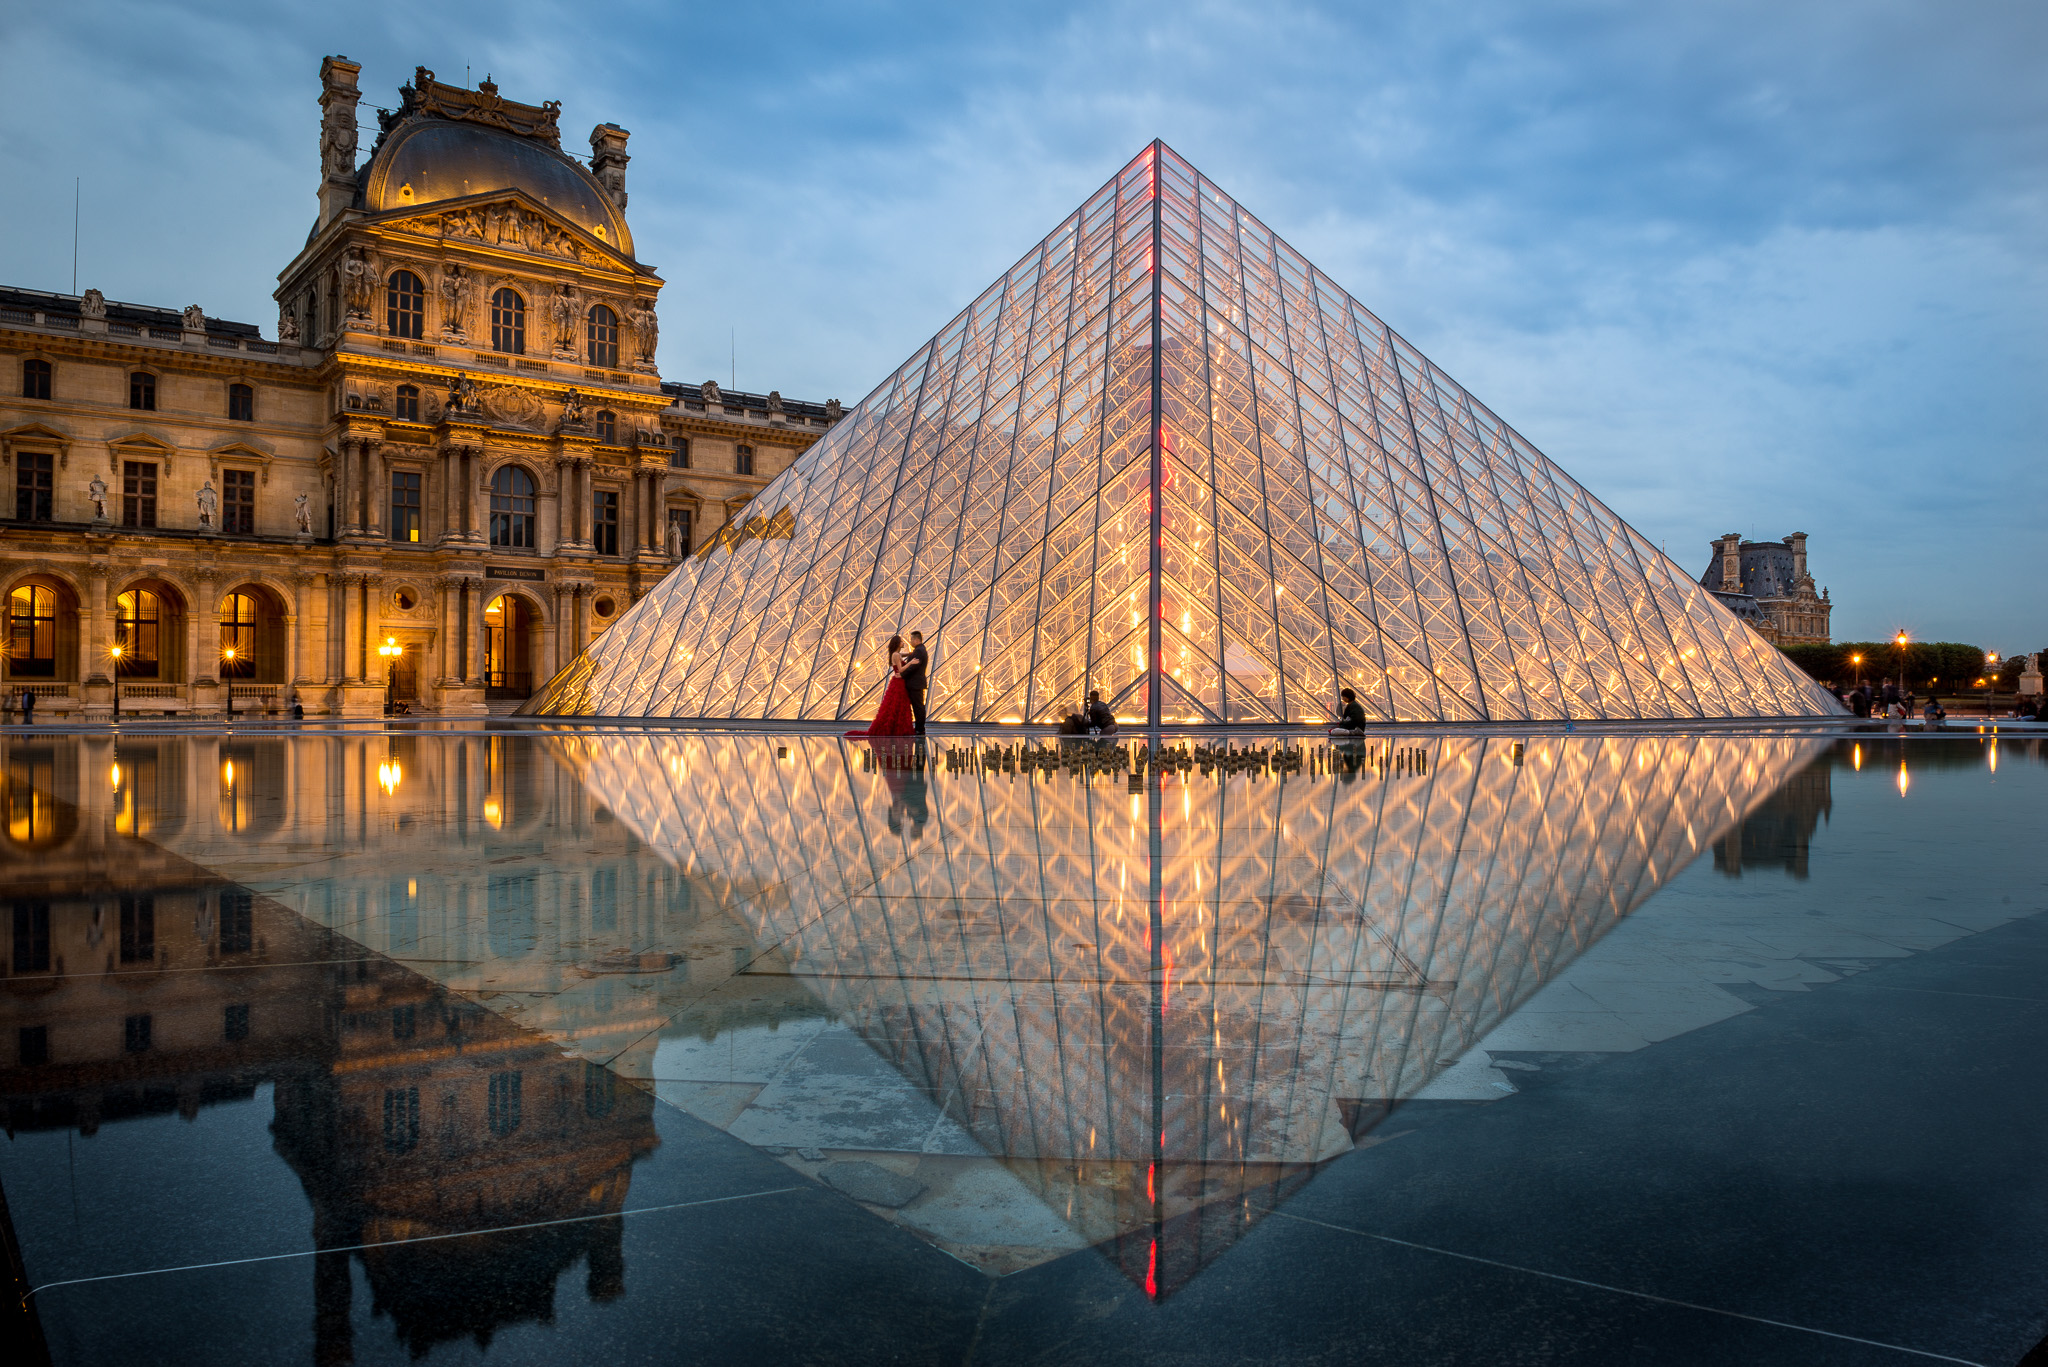 paris-3018.jpg